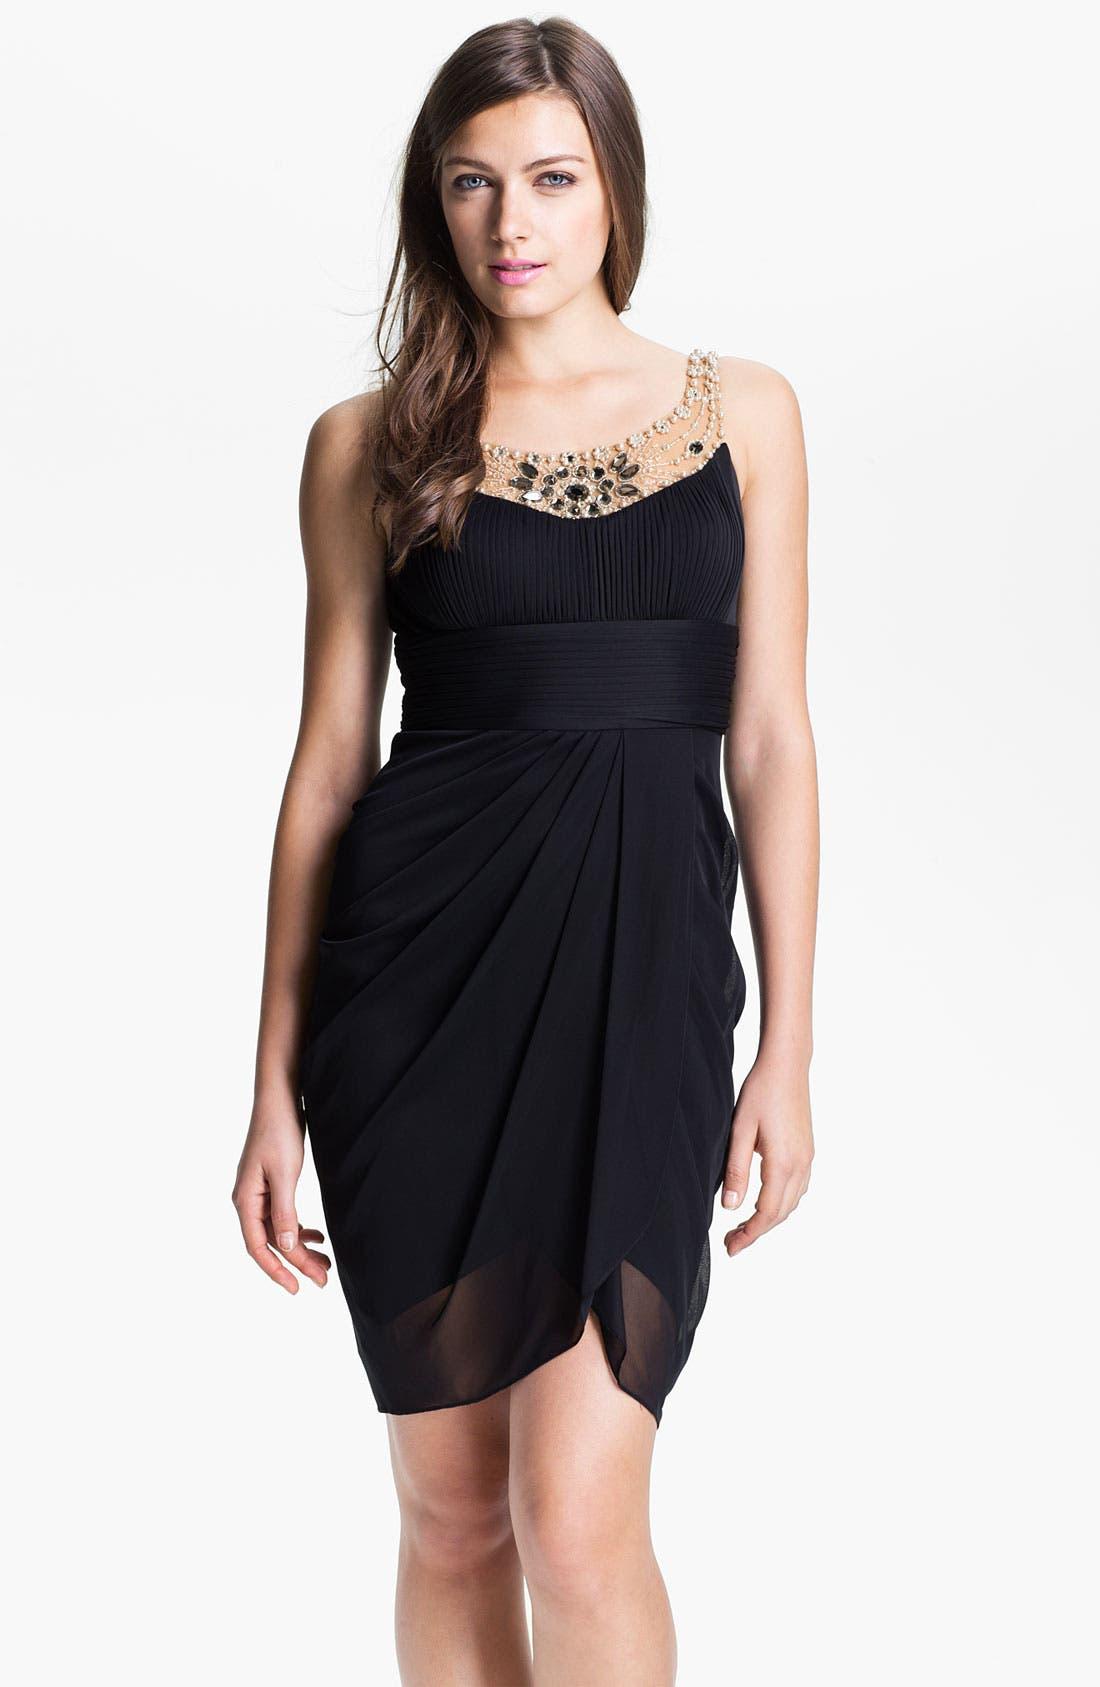 Alternate Image 1 Selected - Adrianna Papell Jeweled Yoke Cocktail Dress